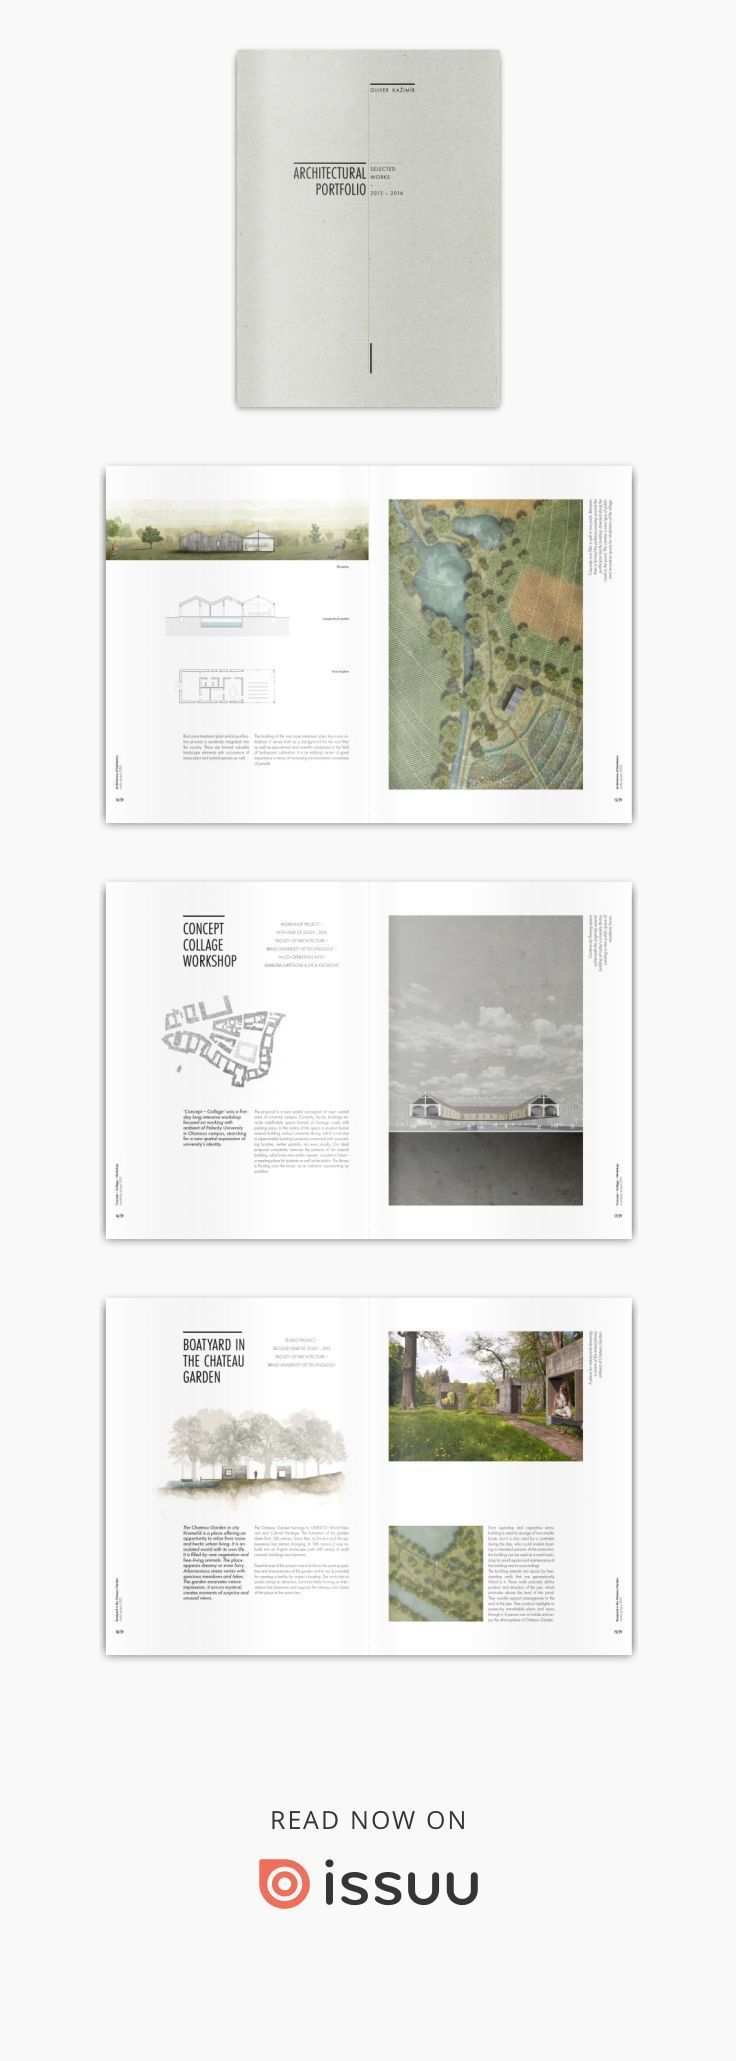 Oliver Kazimir Architectural Portfolio 2016 In 2020 Portfoliolayout Architektur Portfolio Layout Architektur Portfolio